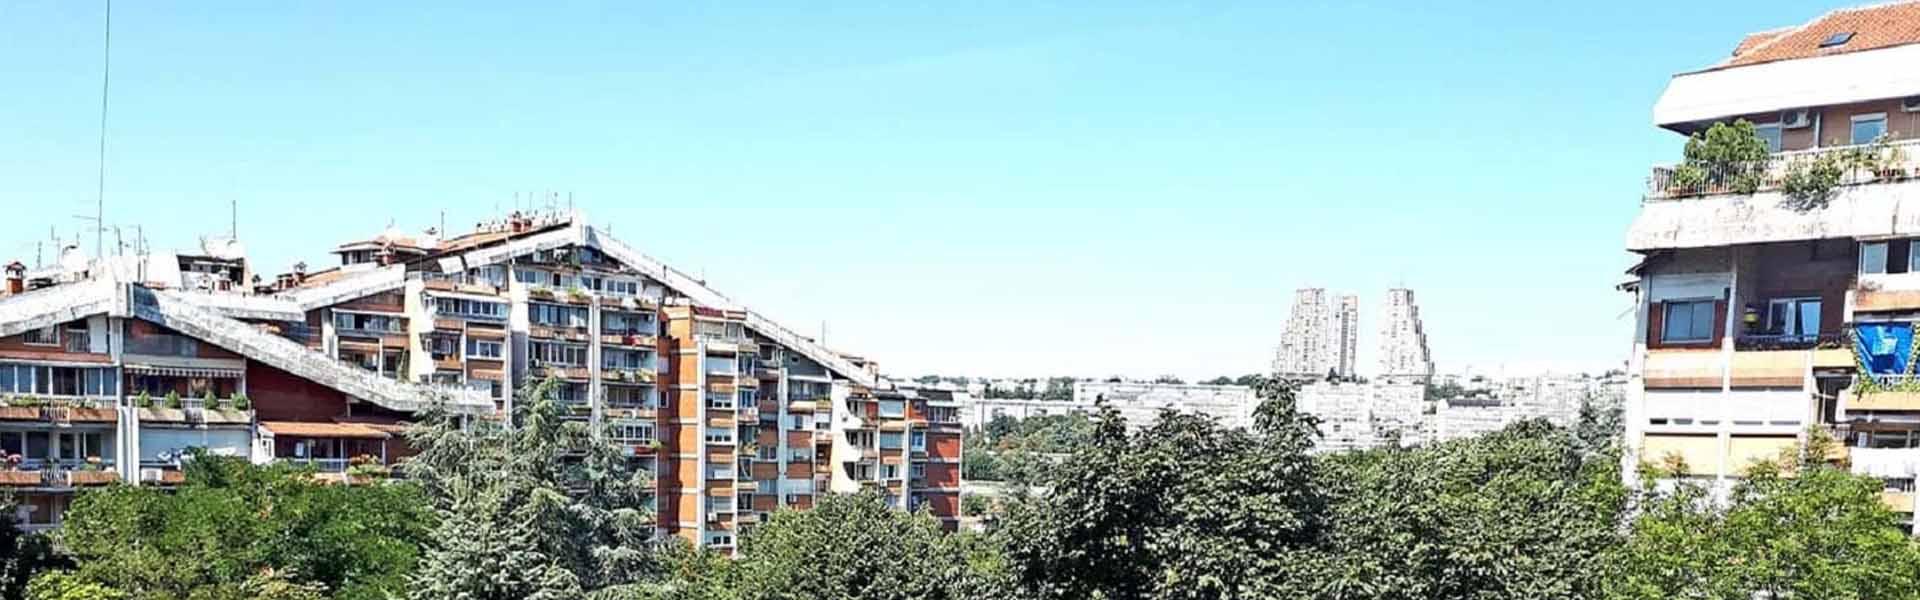 Dostava hrane Medaković | Beograd